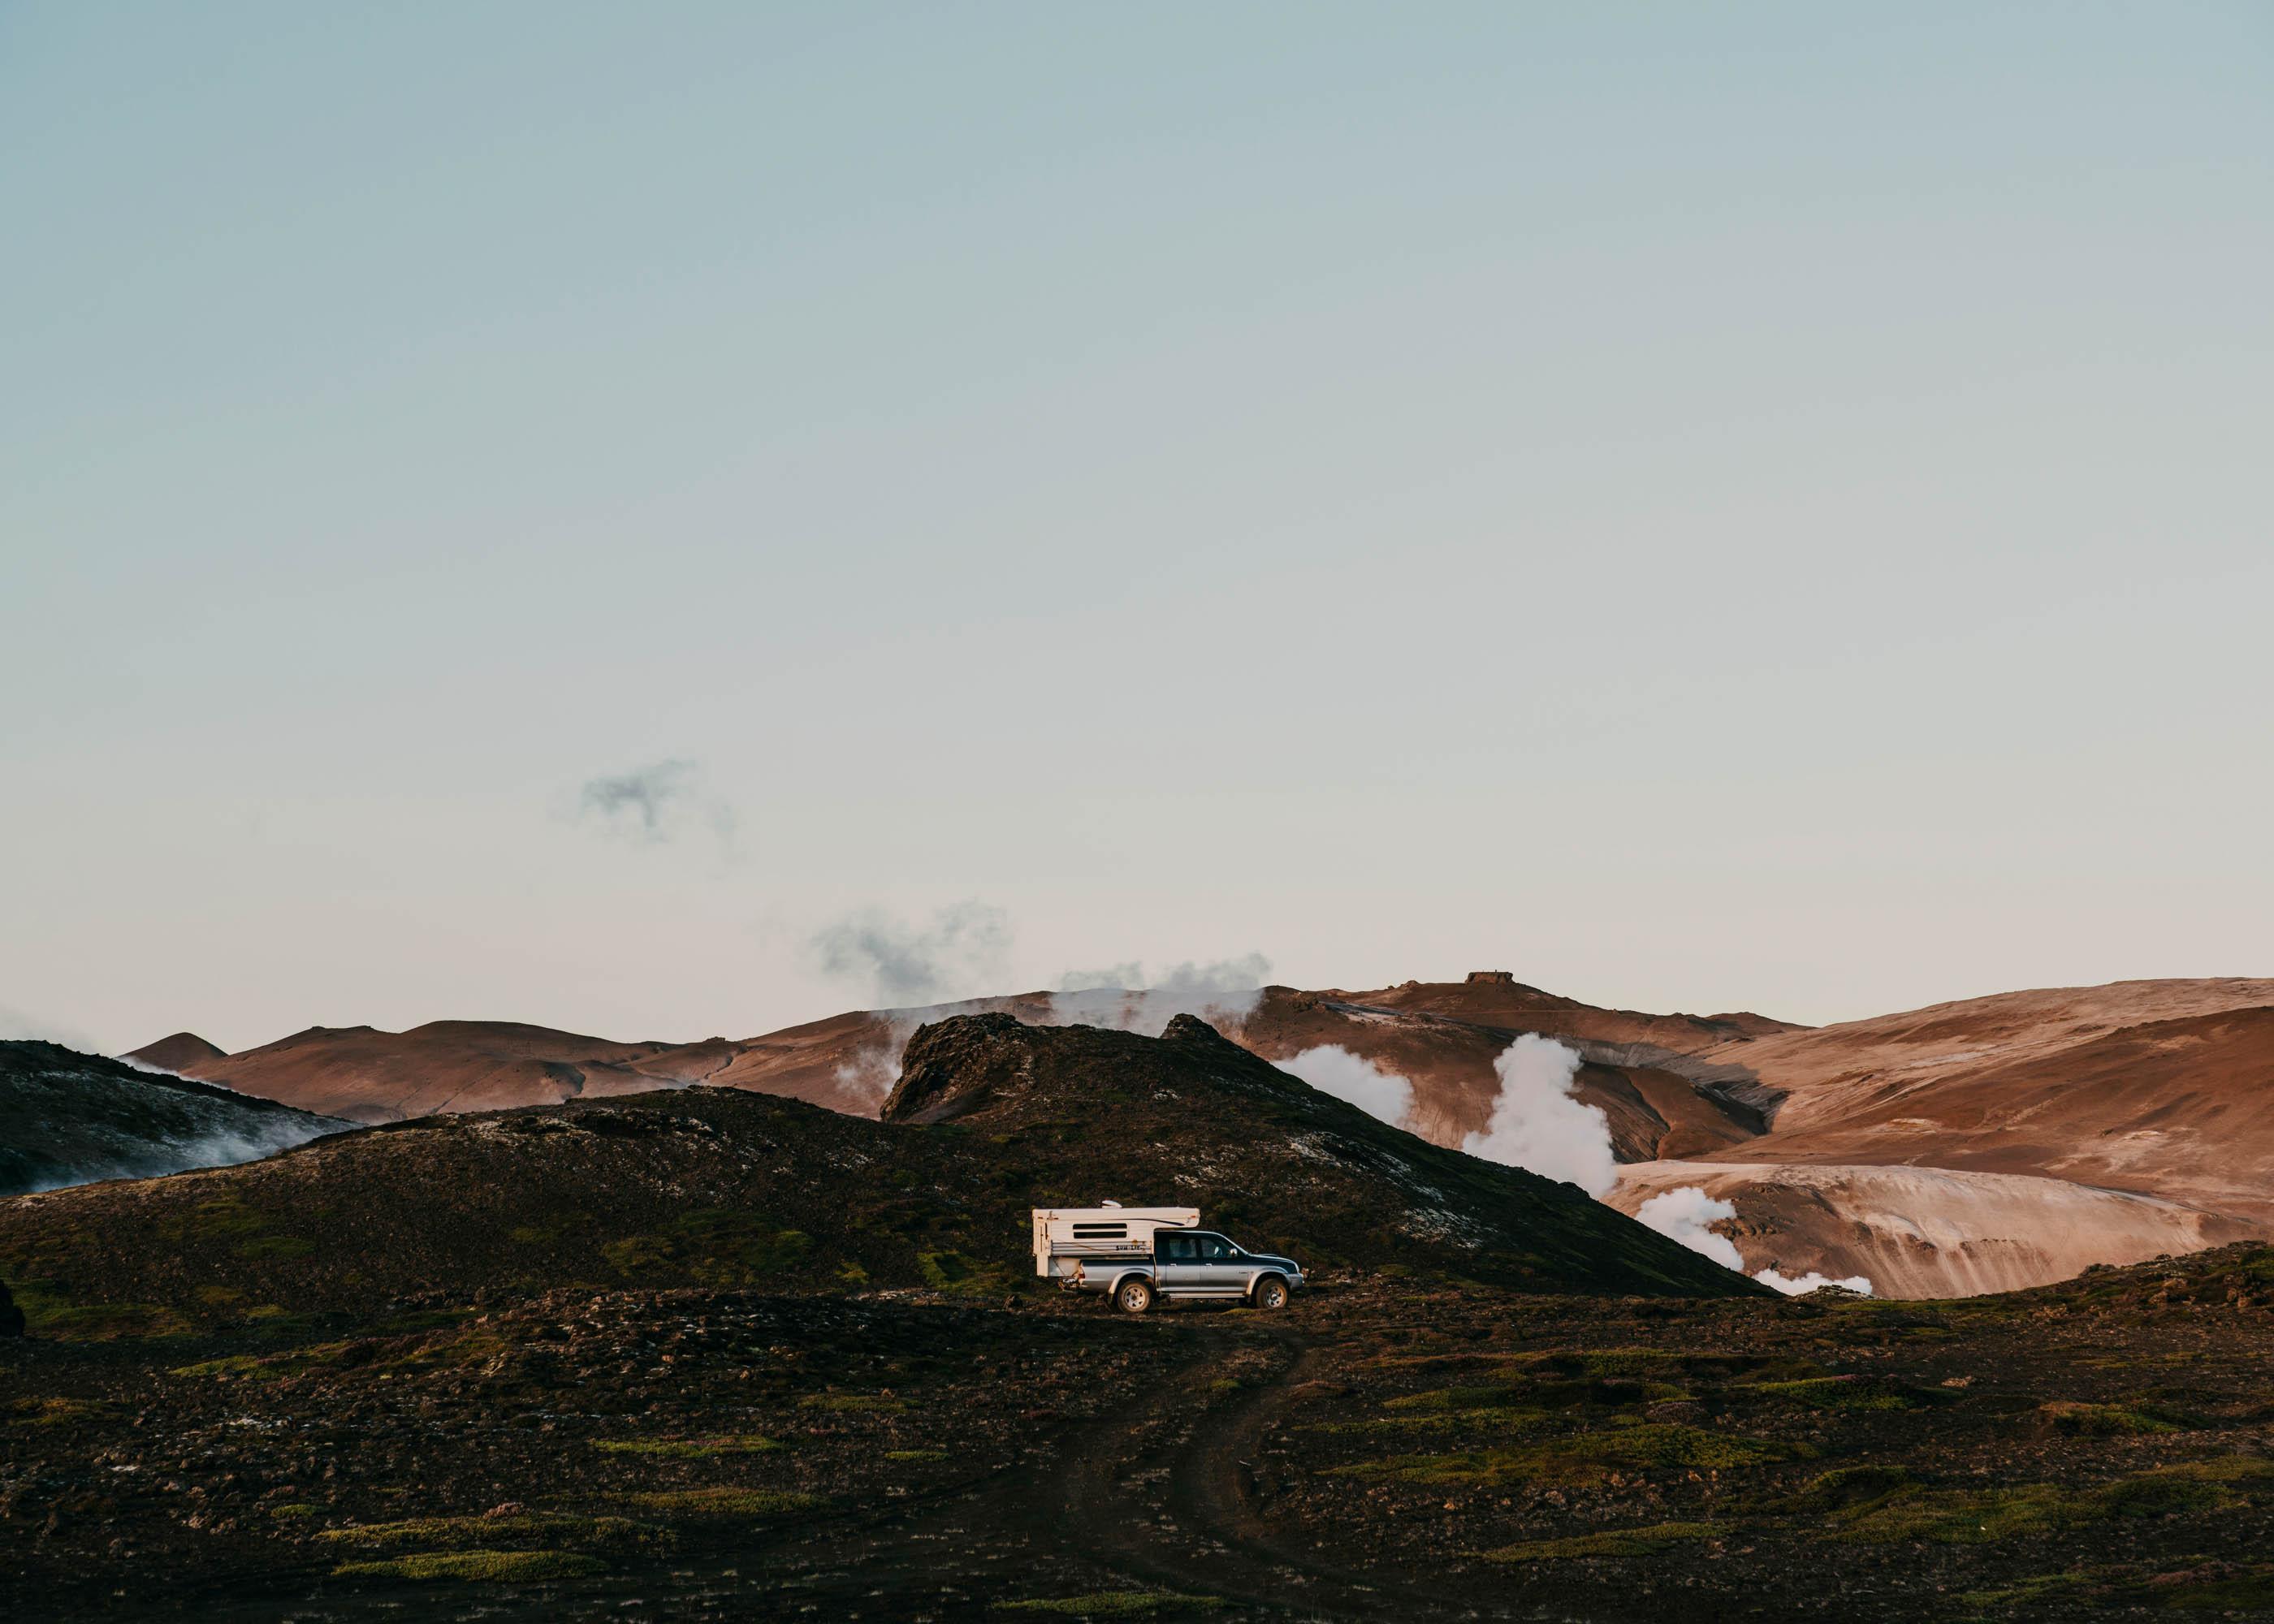 #1617 #personal #iceland #myvatn #mountains #landscapes #caravan